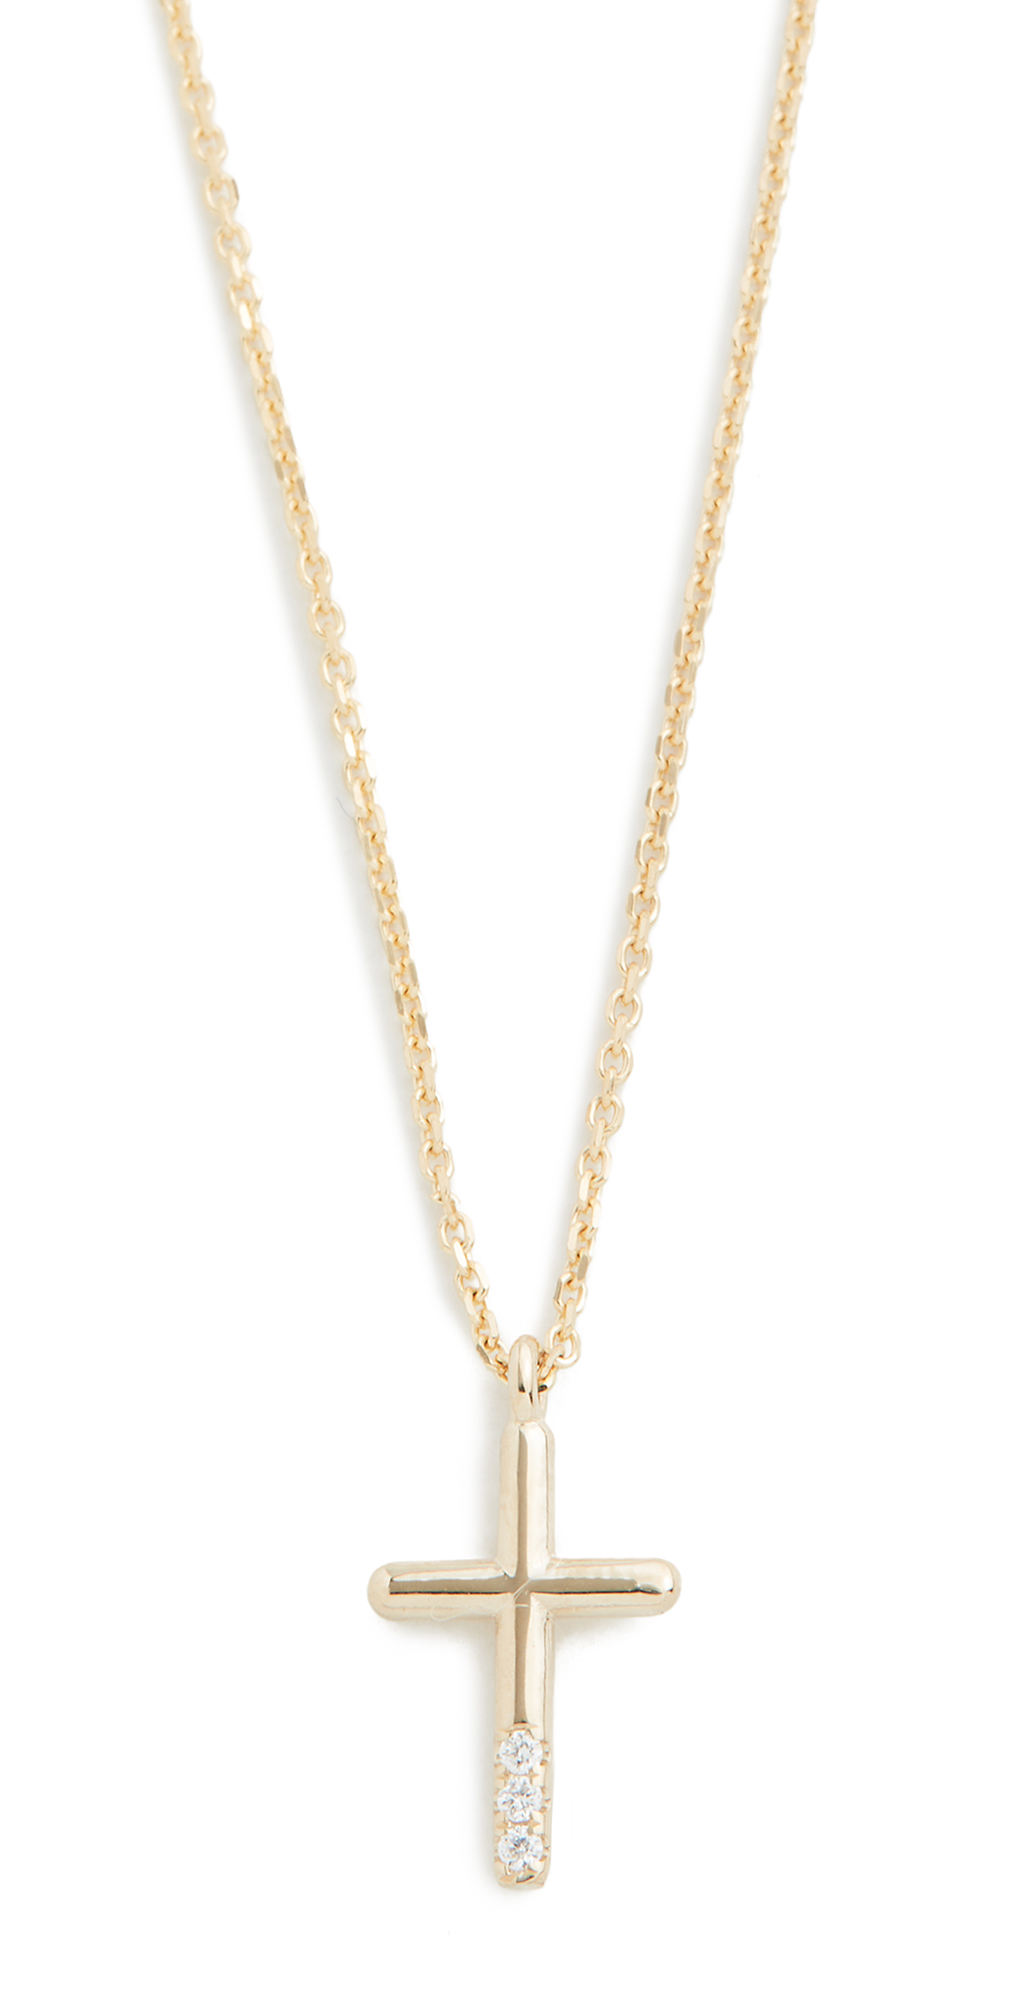 14k Diamond Cross Necklace